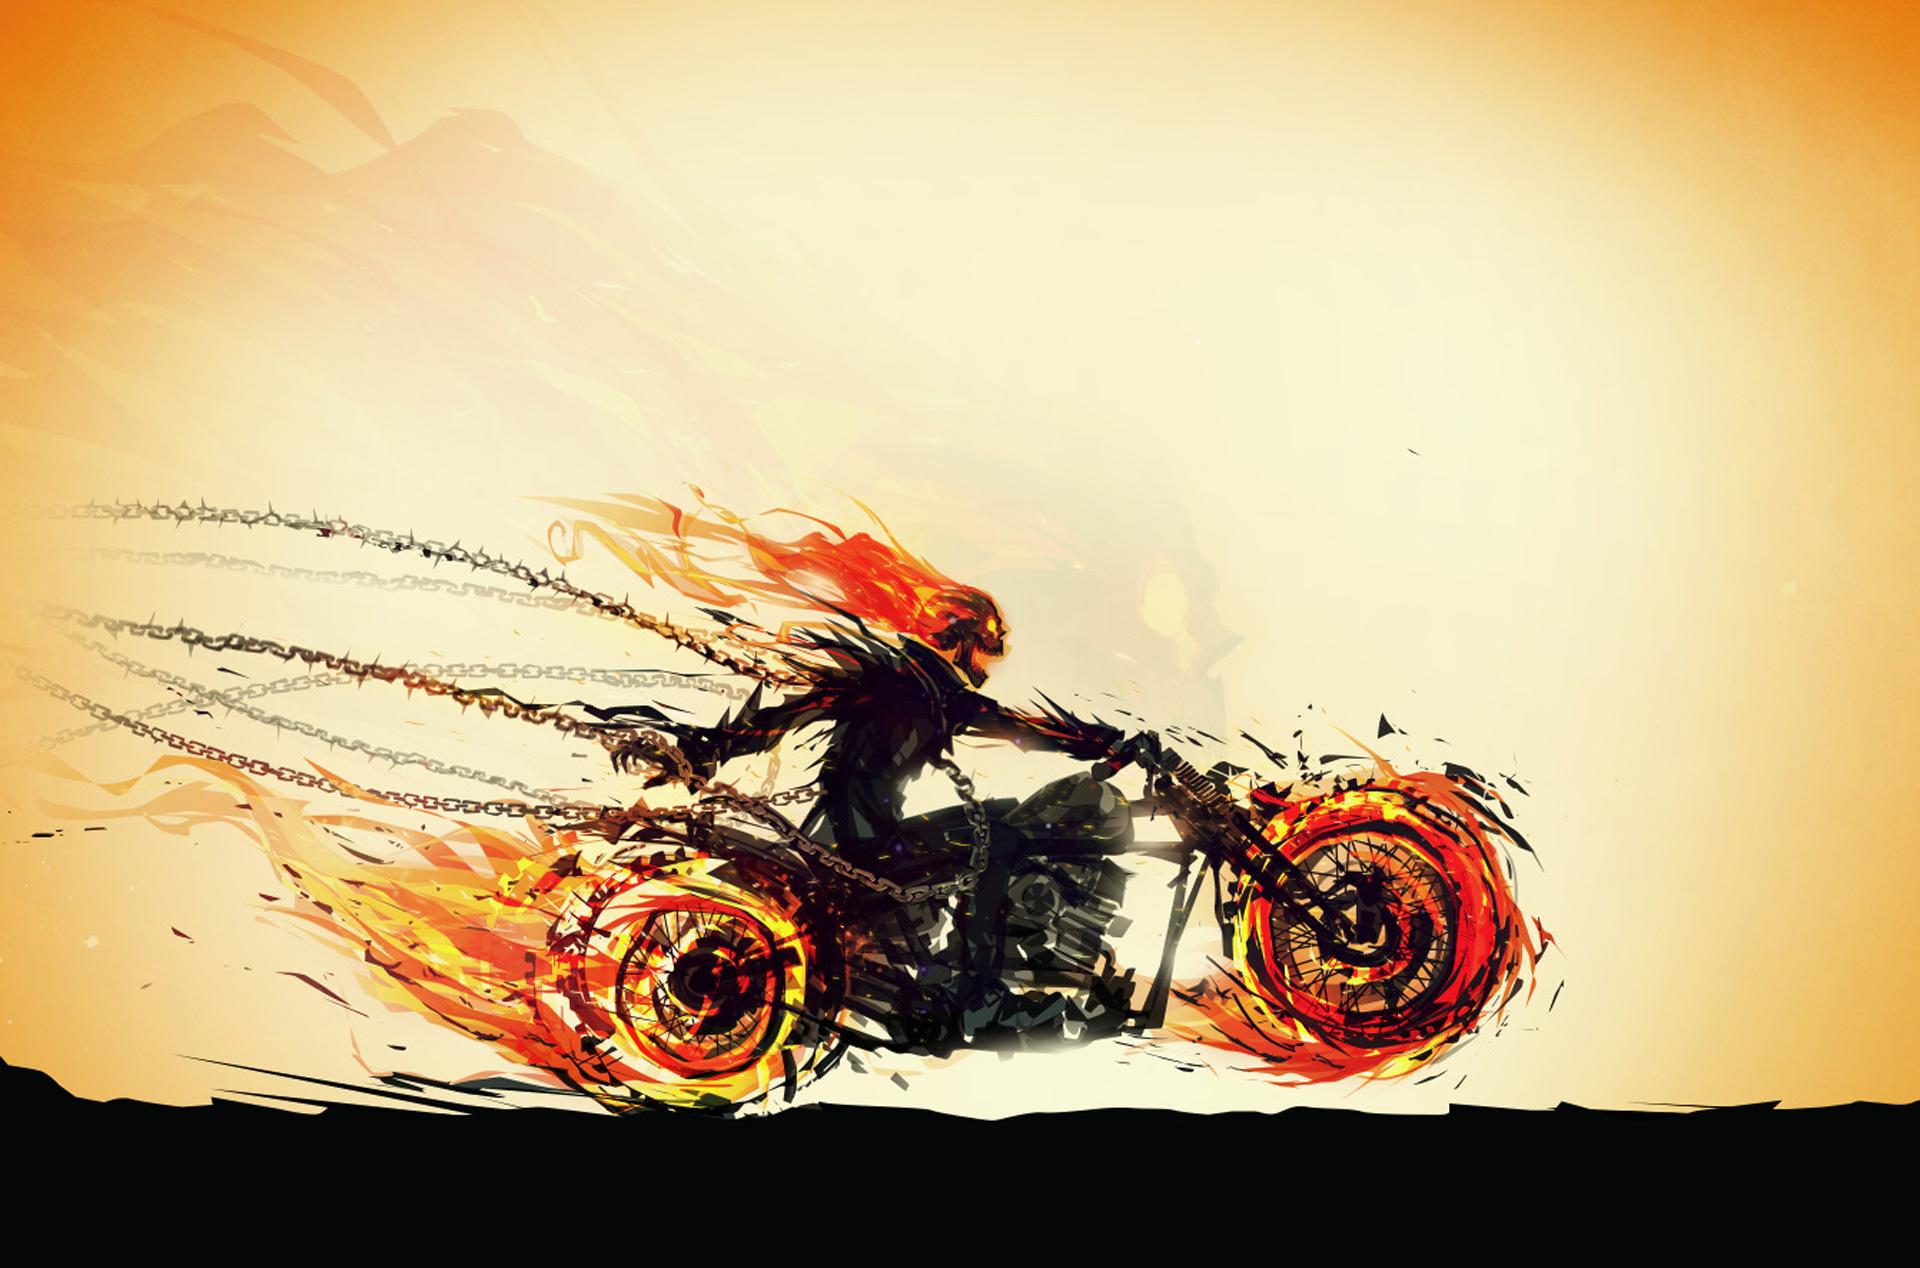 Ghost Rider Digital Painting | Photoshop Digital Painting ...  |Ghost Rider Digital Painting Photoshop